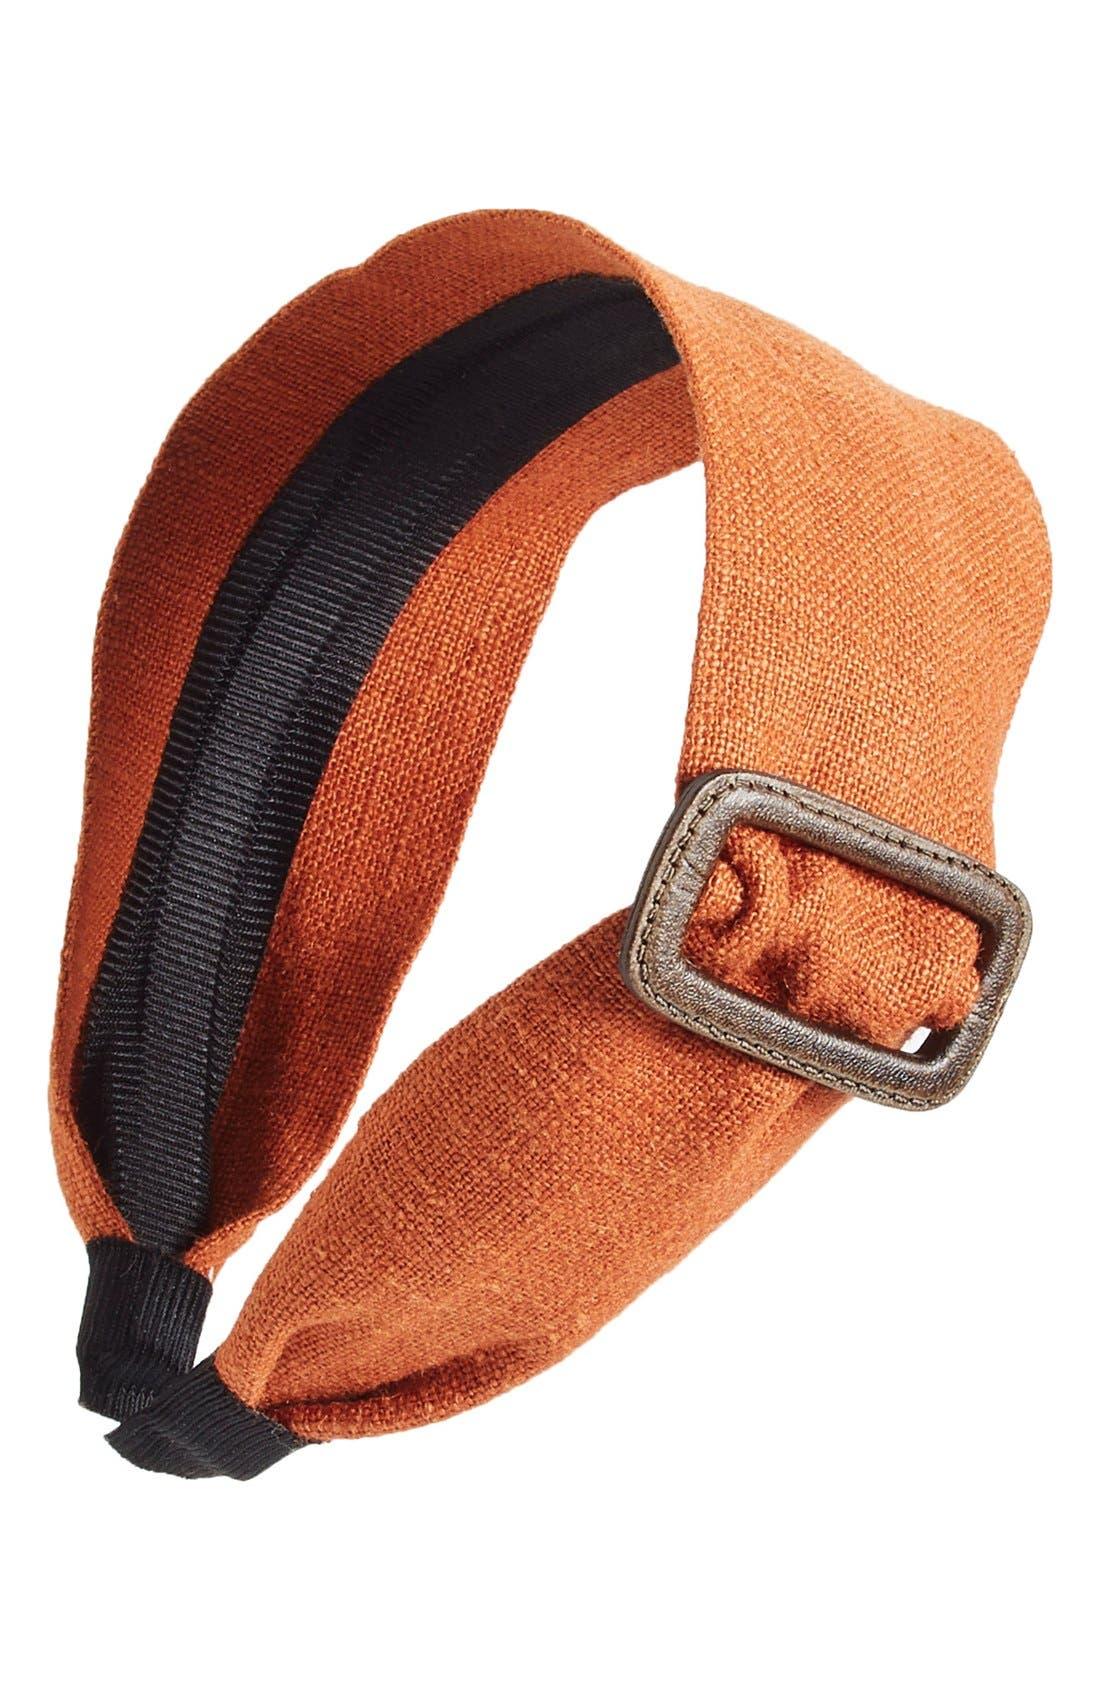 Alternate Image 1 Selected - Ficcare Buckle Headband